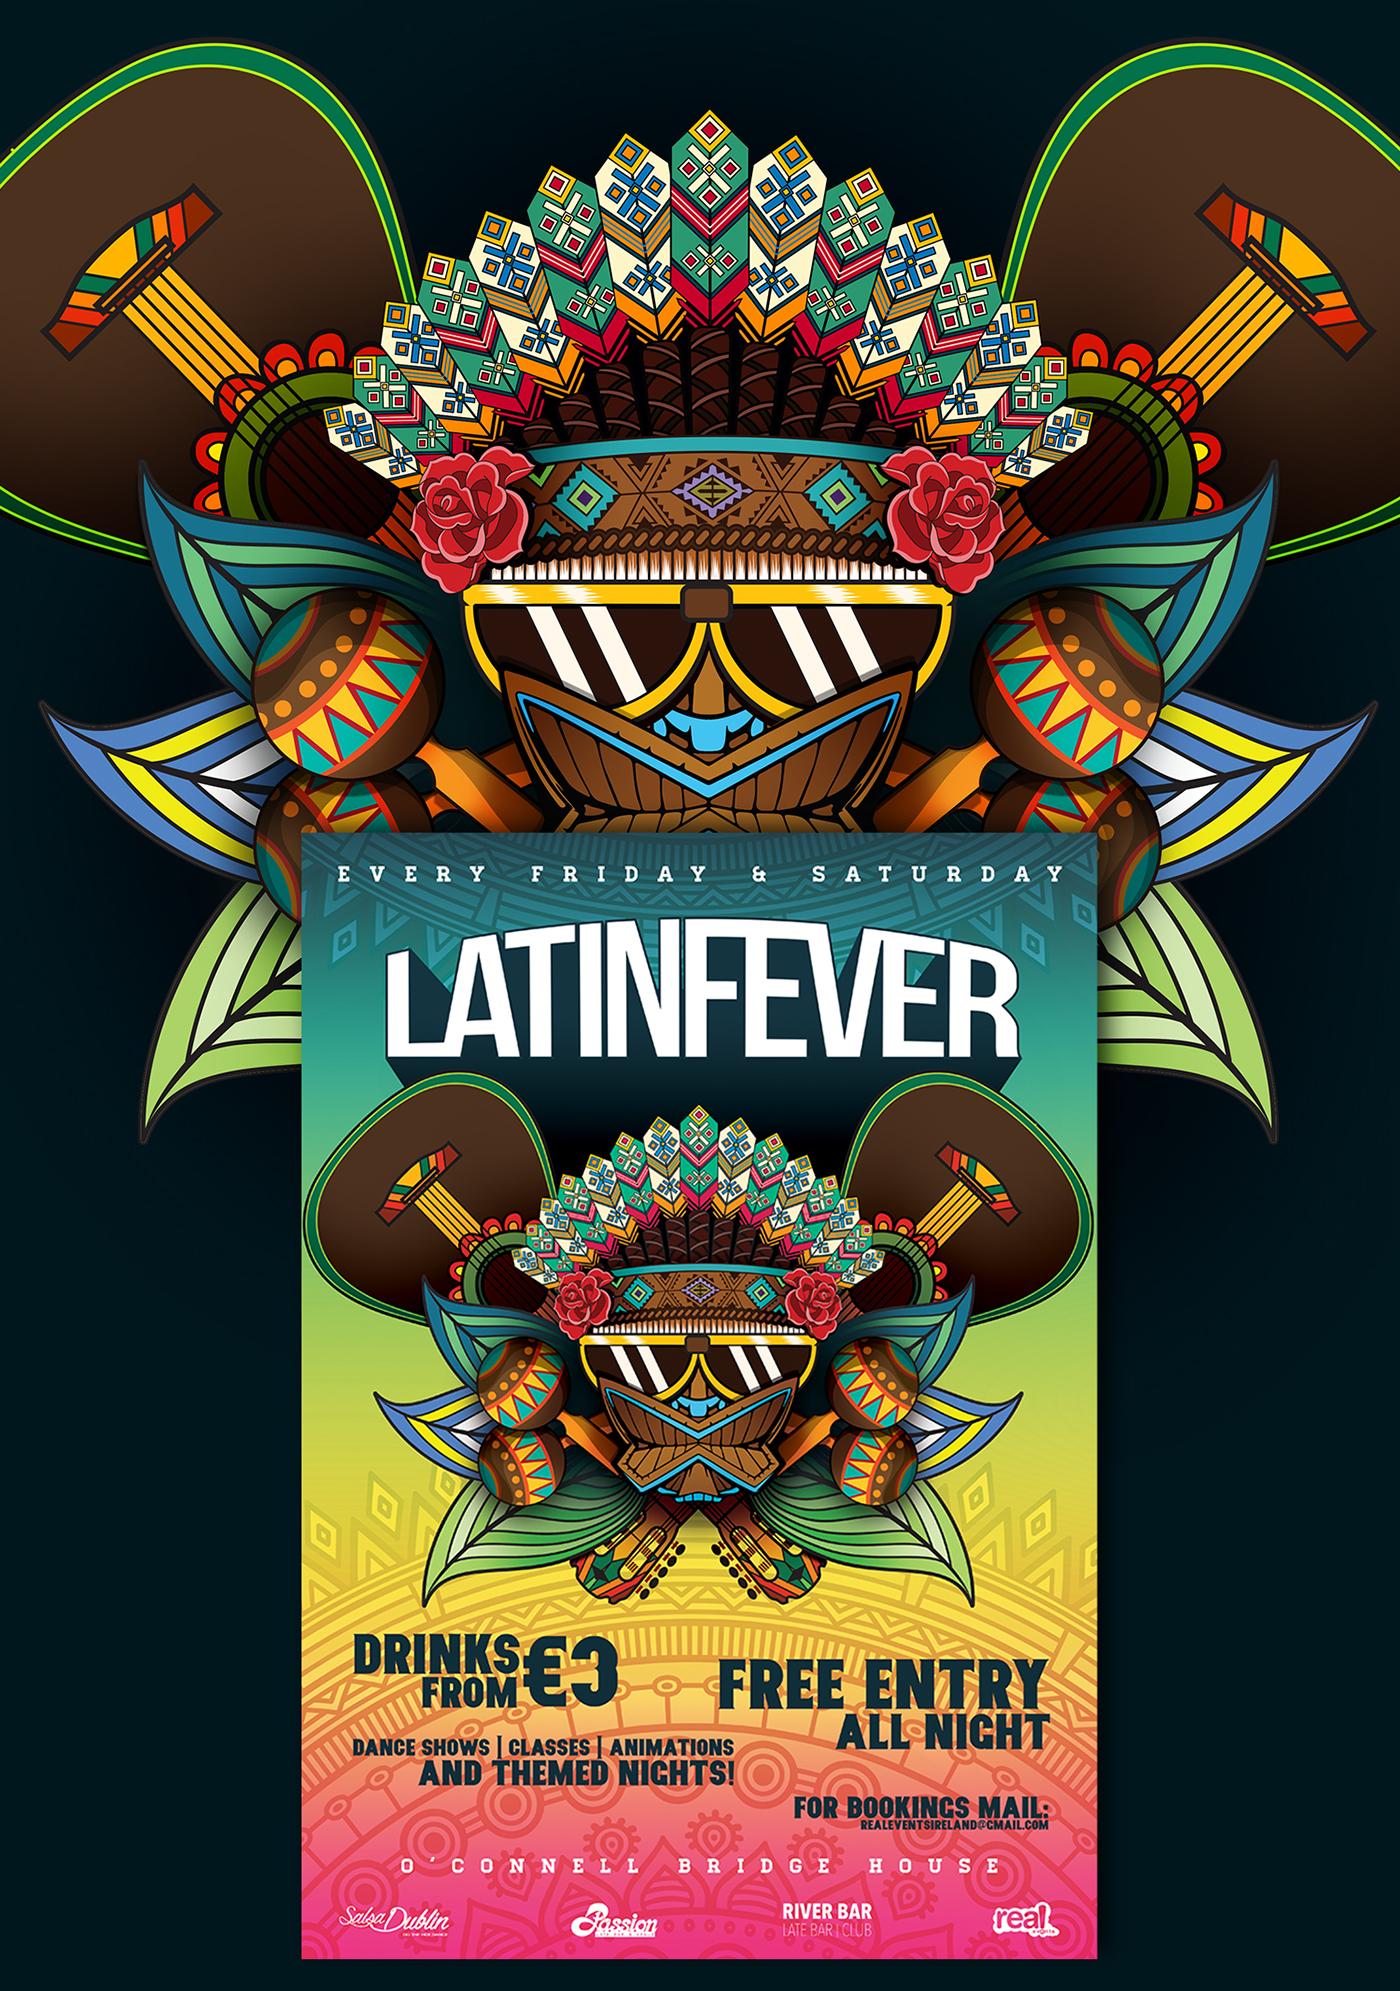 carranca Cocar latino latinparty dublin Ireland latinfever music party ILLUSTRATION